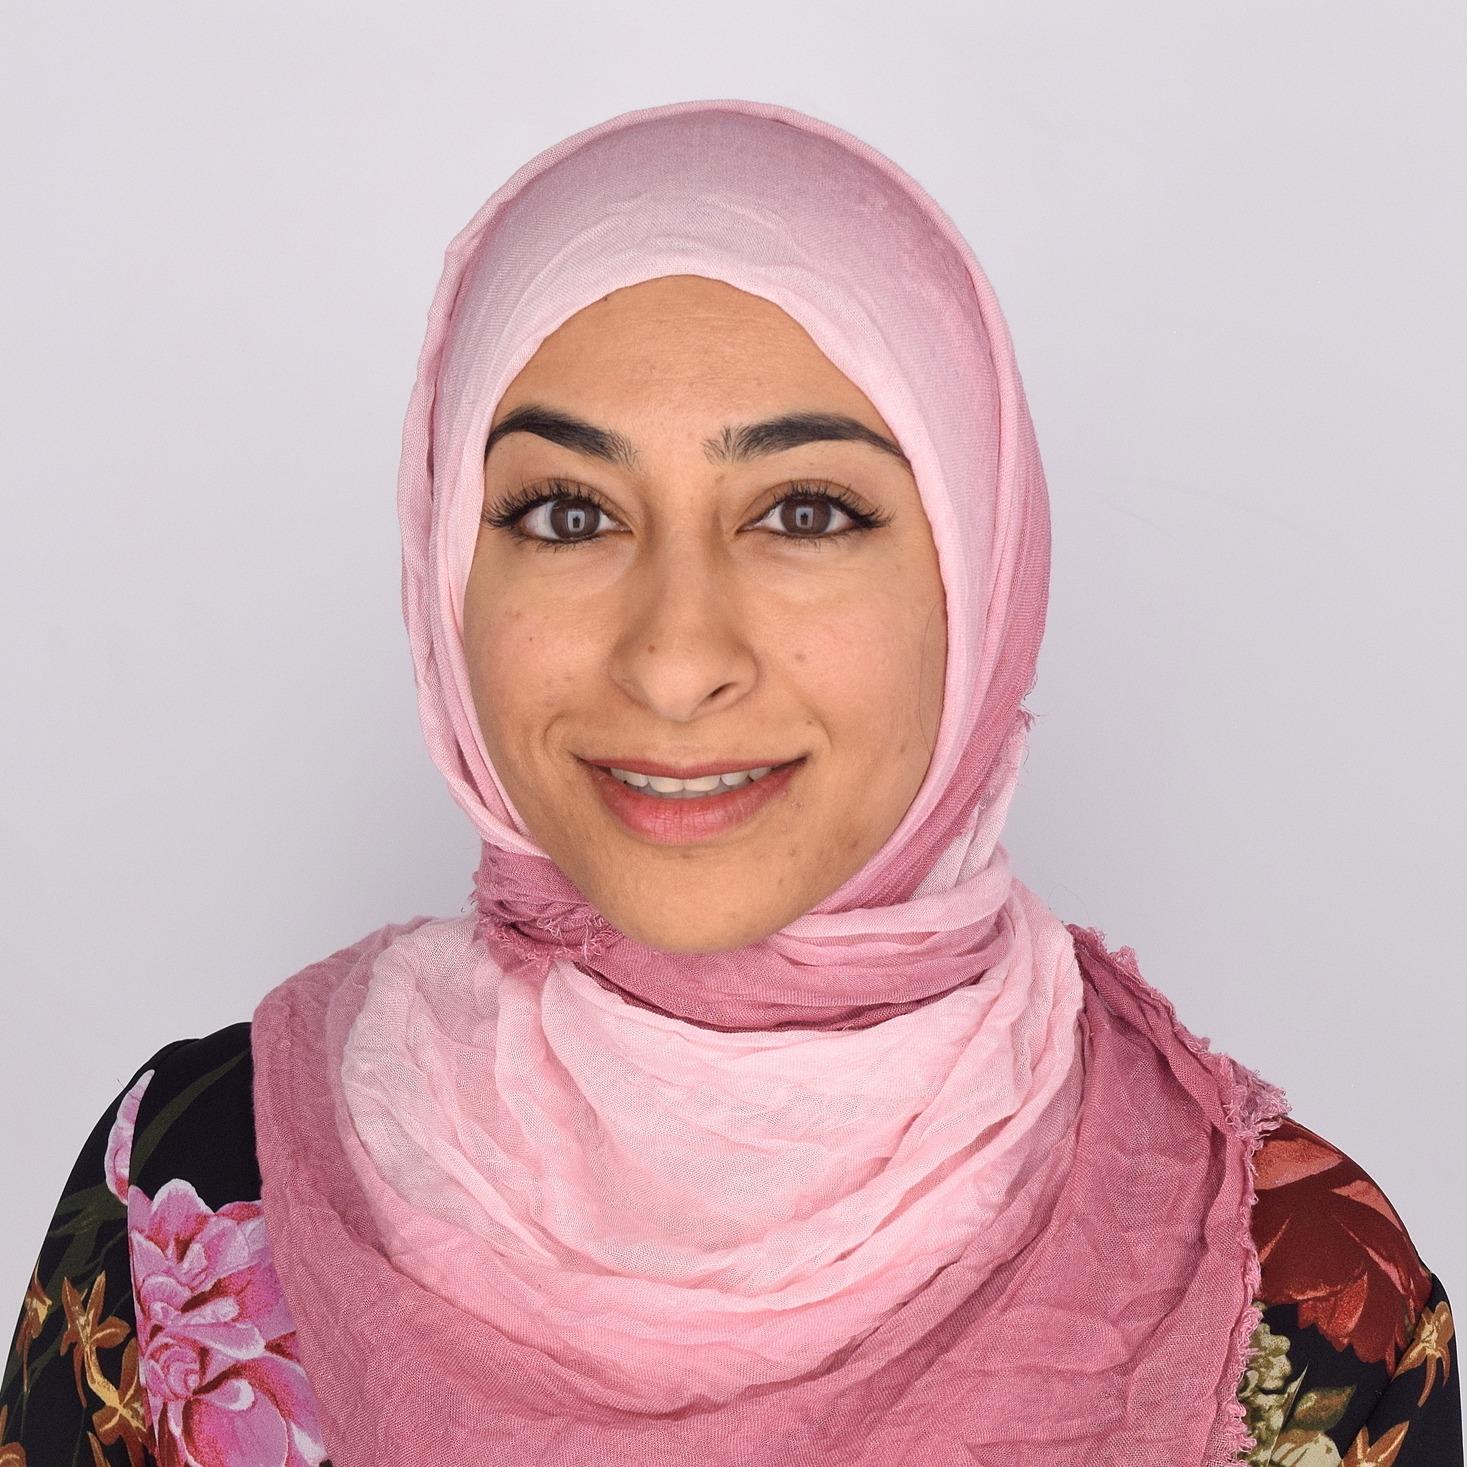 Muna Hussaini, an Indian-American woman wearing a headscarf.